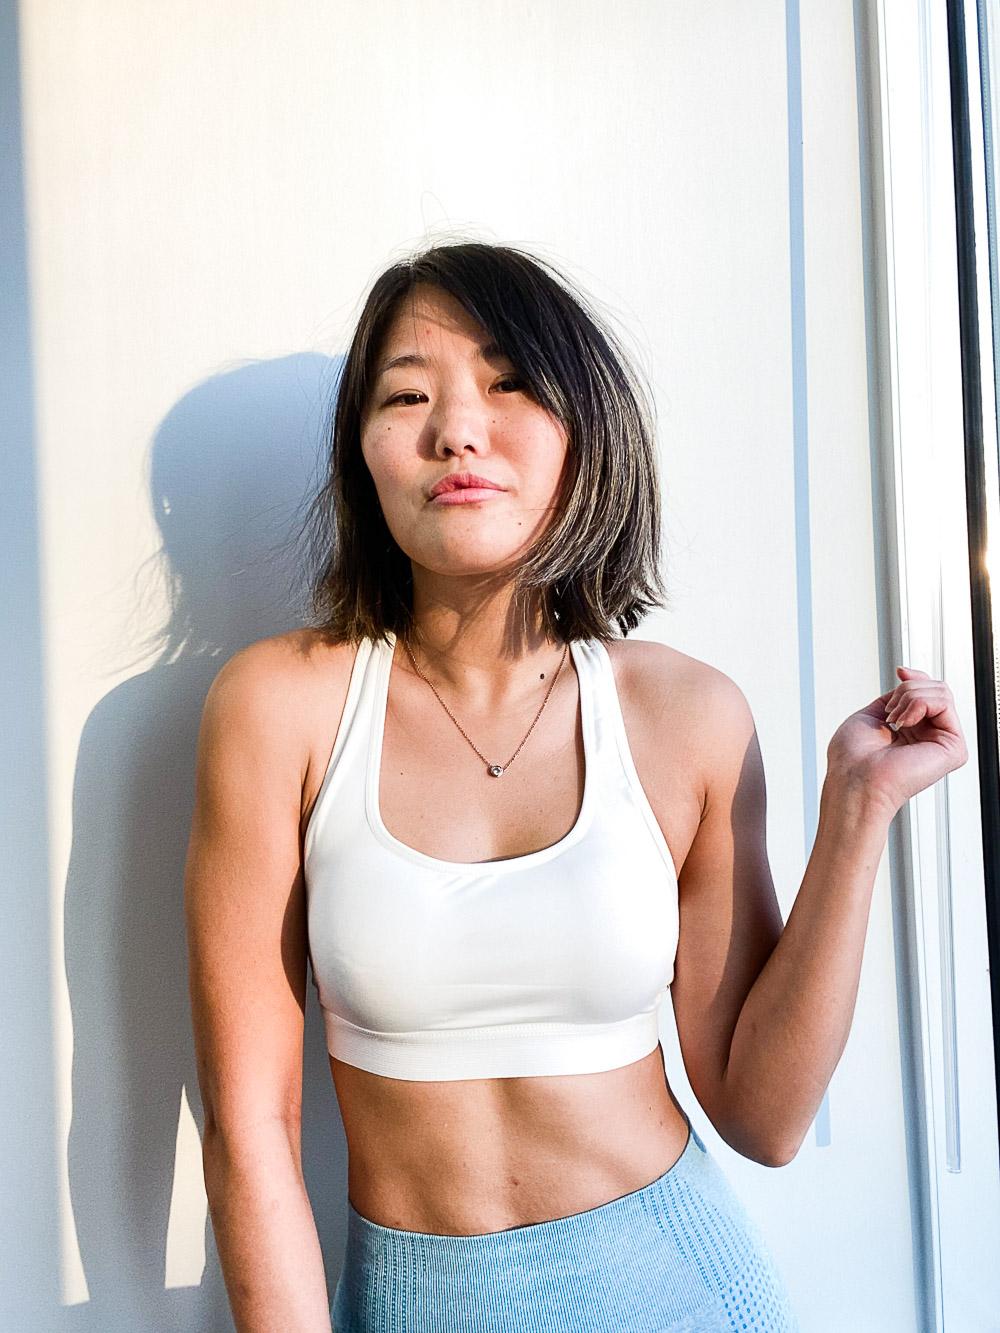 kpop 90 degree shoulders